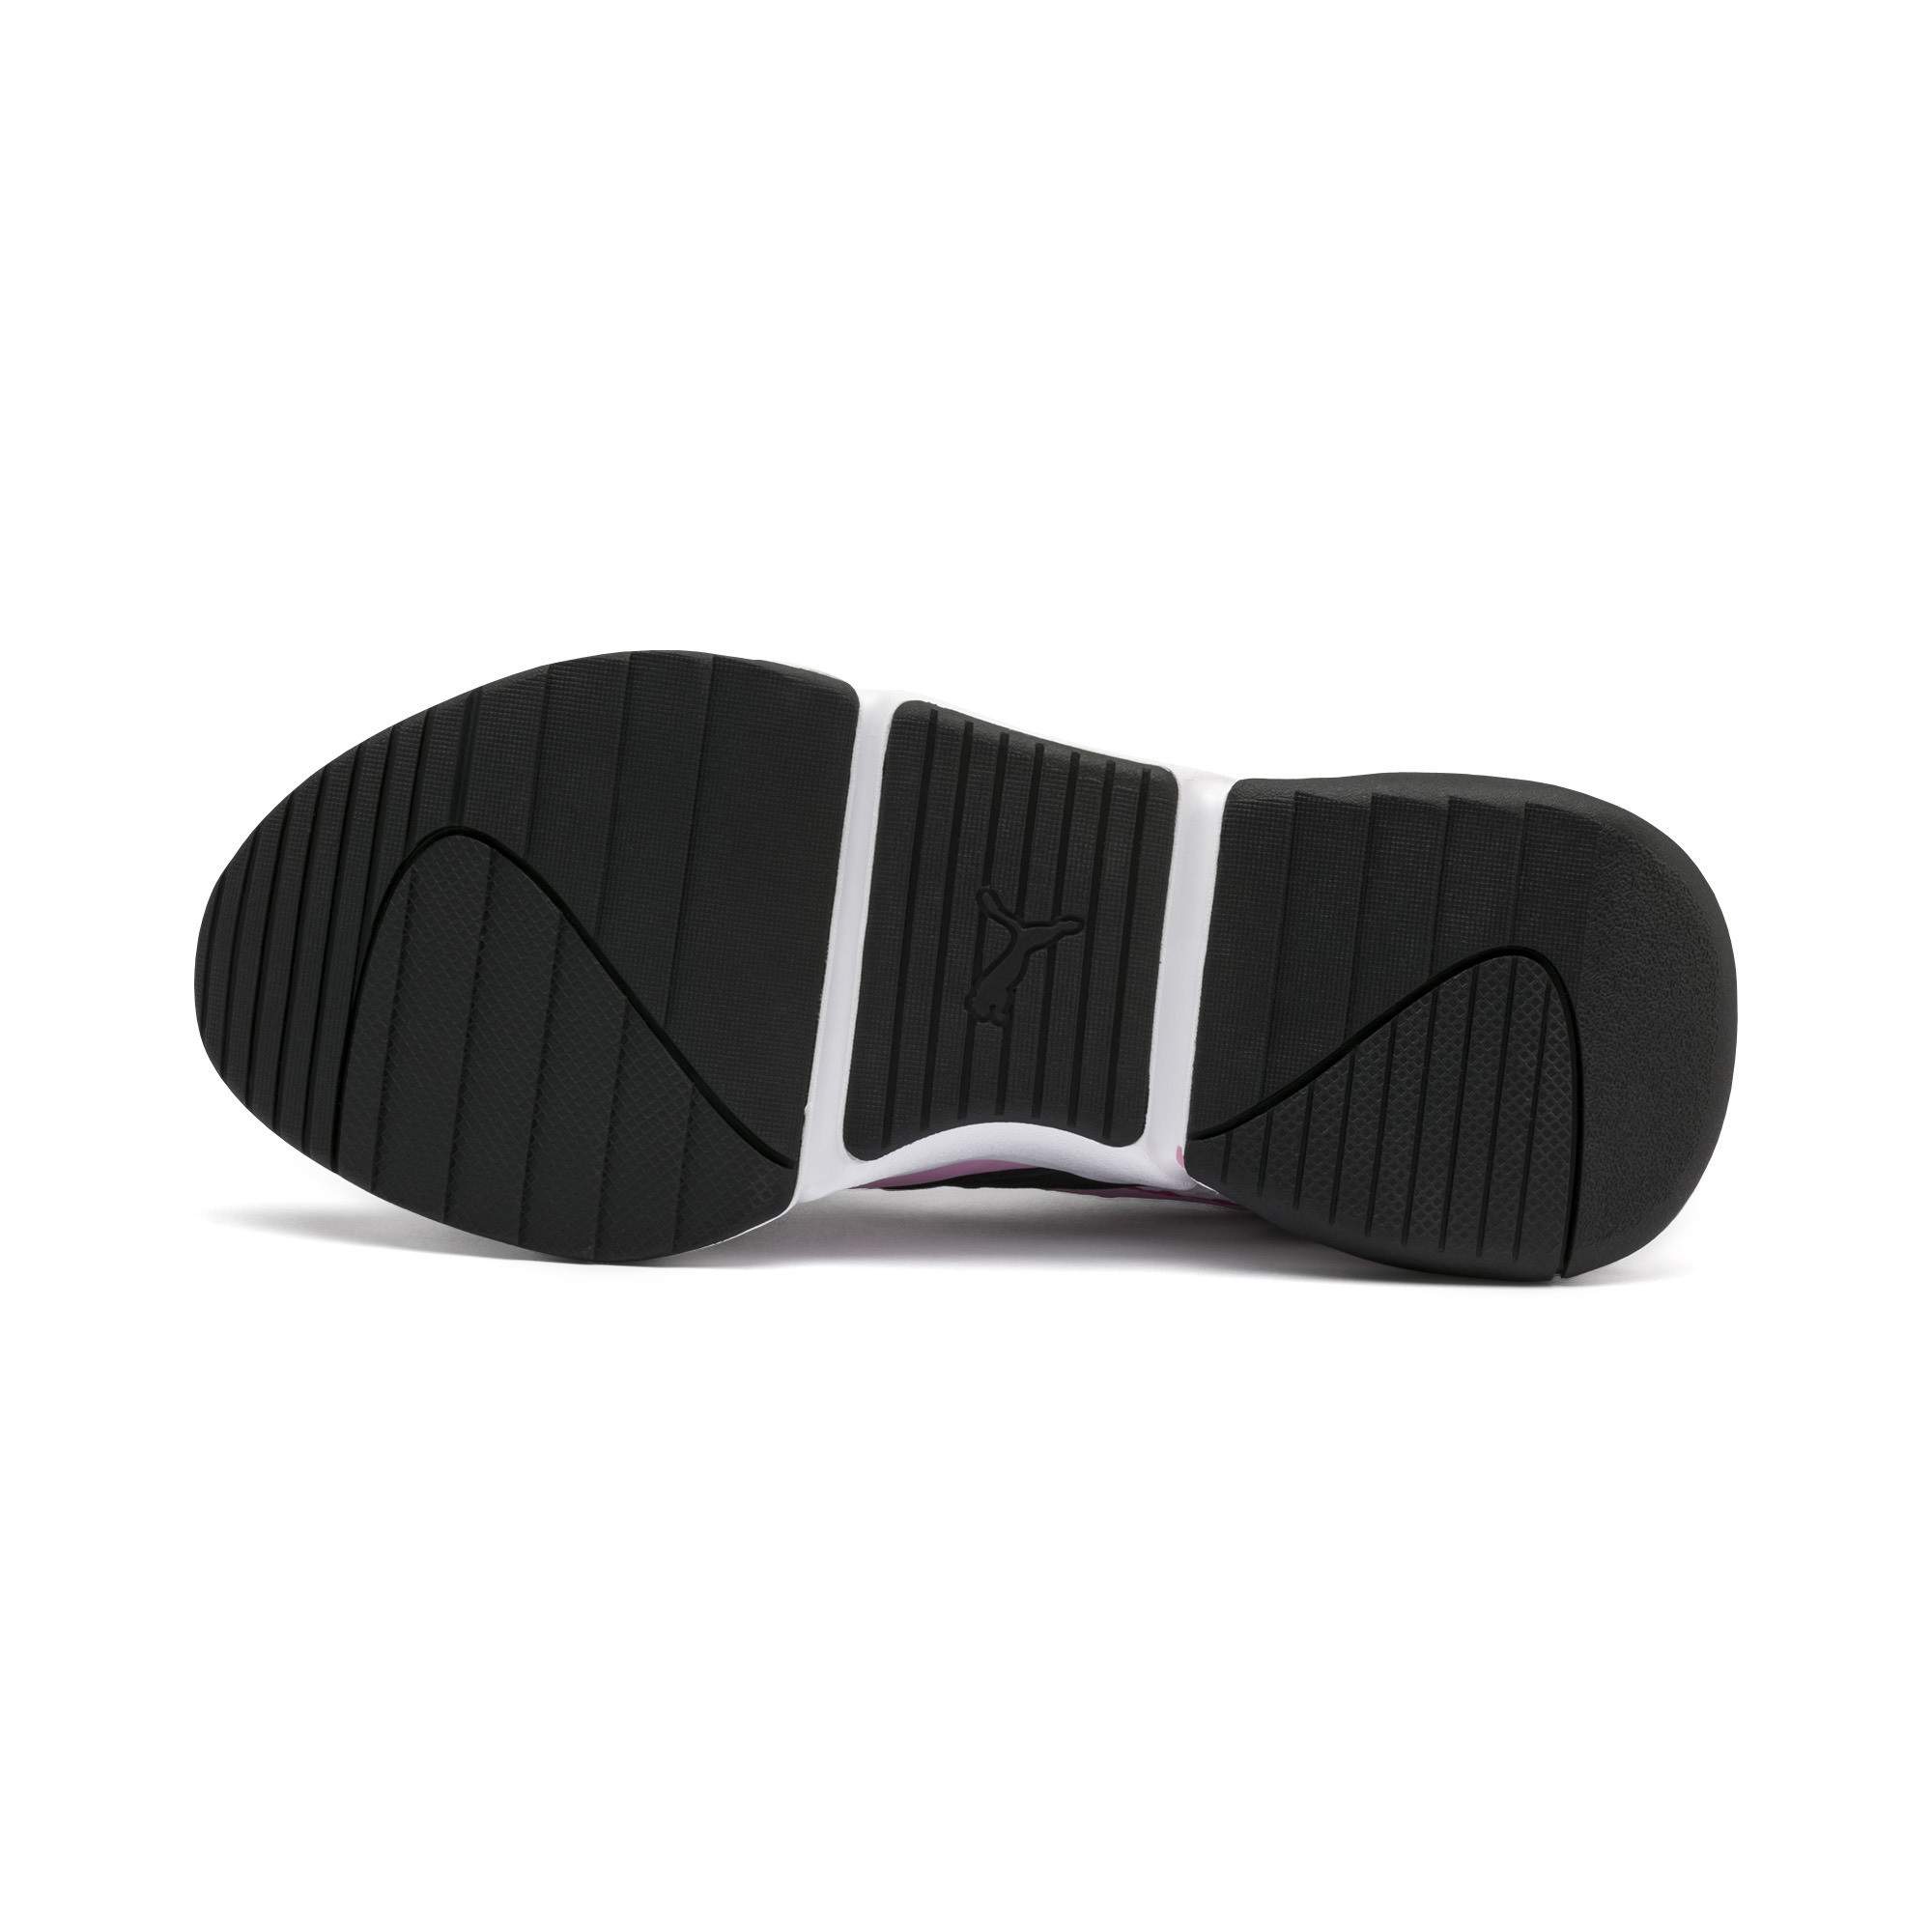 Zapatillas Nova '90s Bloc para mujer